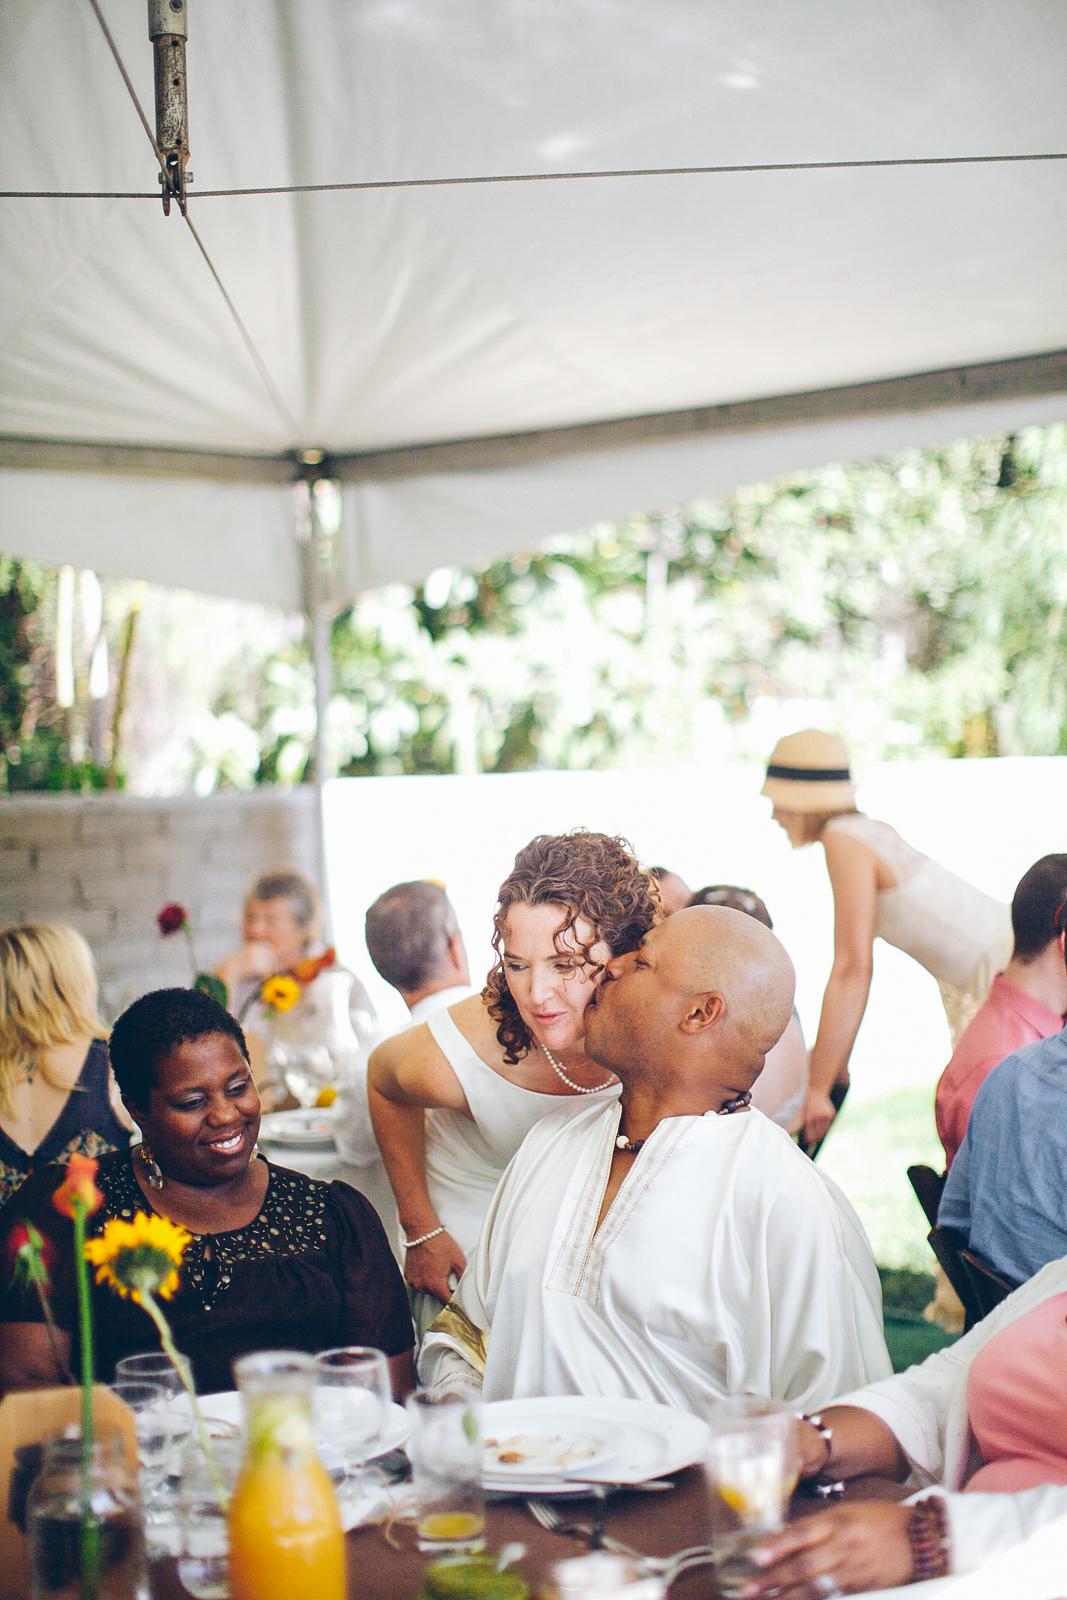 Riverside_ca_wedding_photography_marguerite_carolyn_ebony_siovhan_bokeh_photography_52.jpg